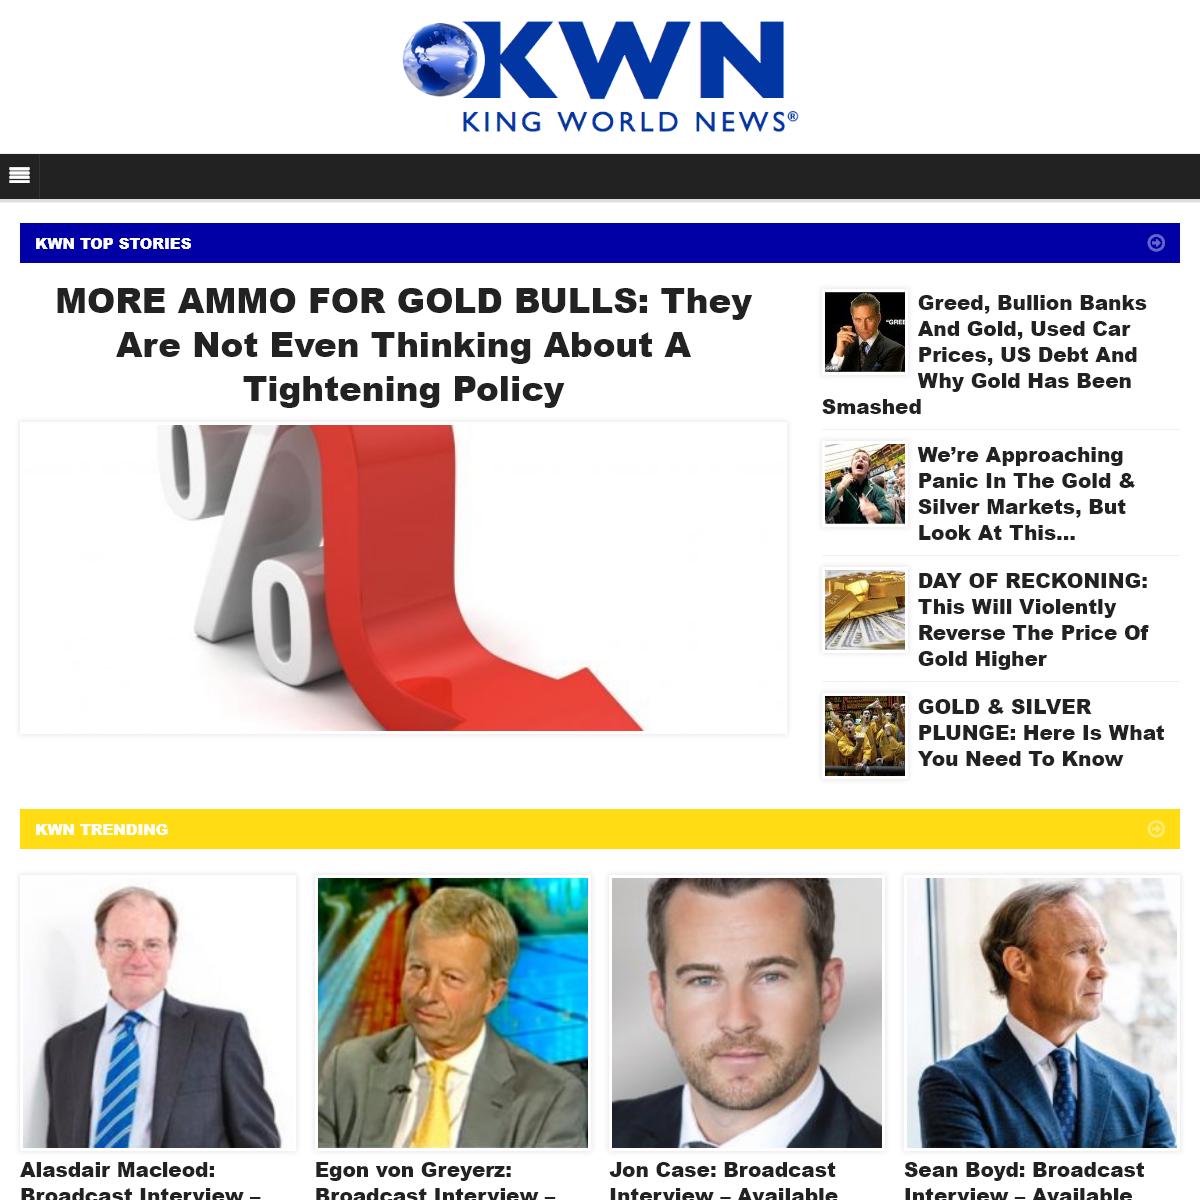 King World News